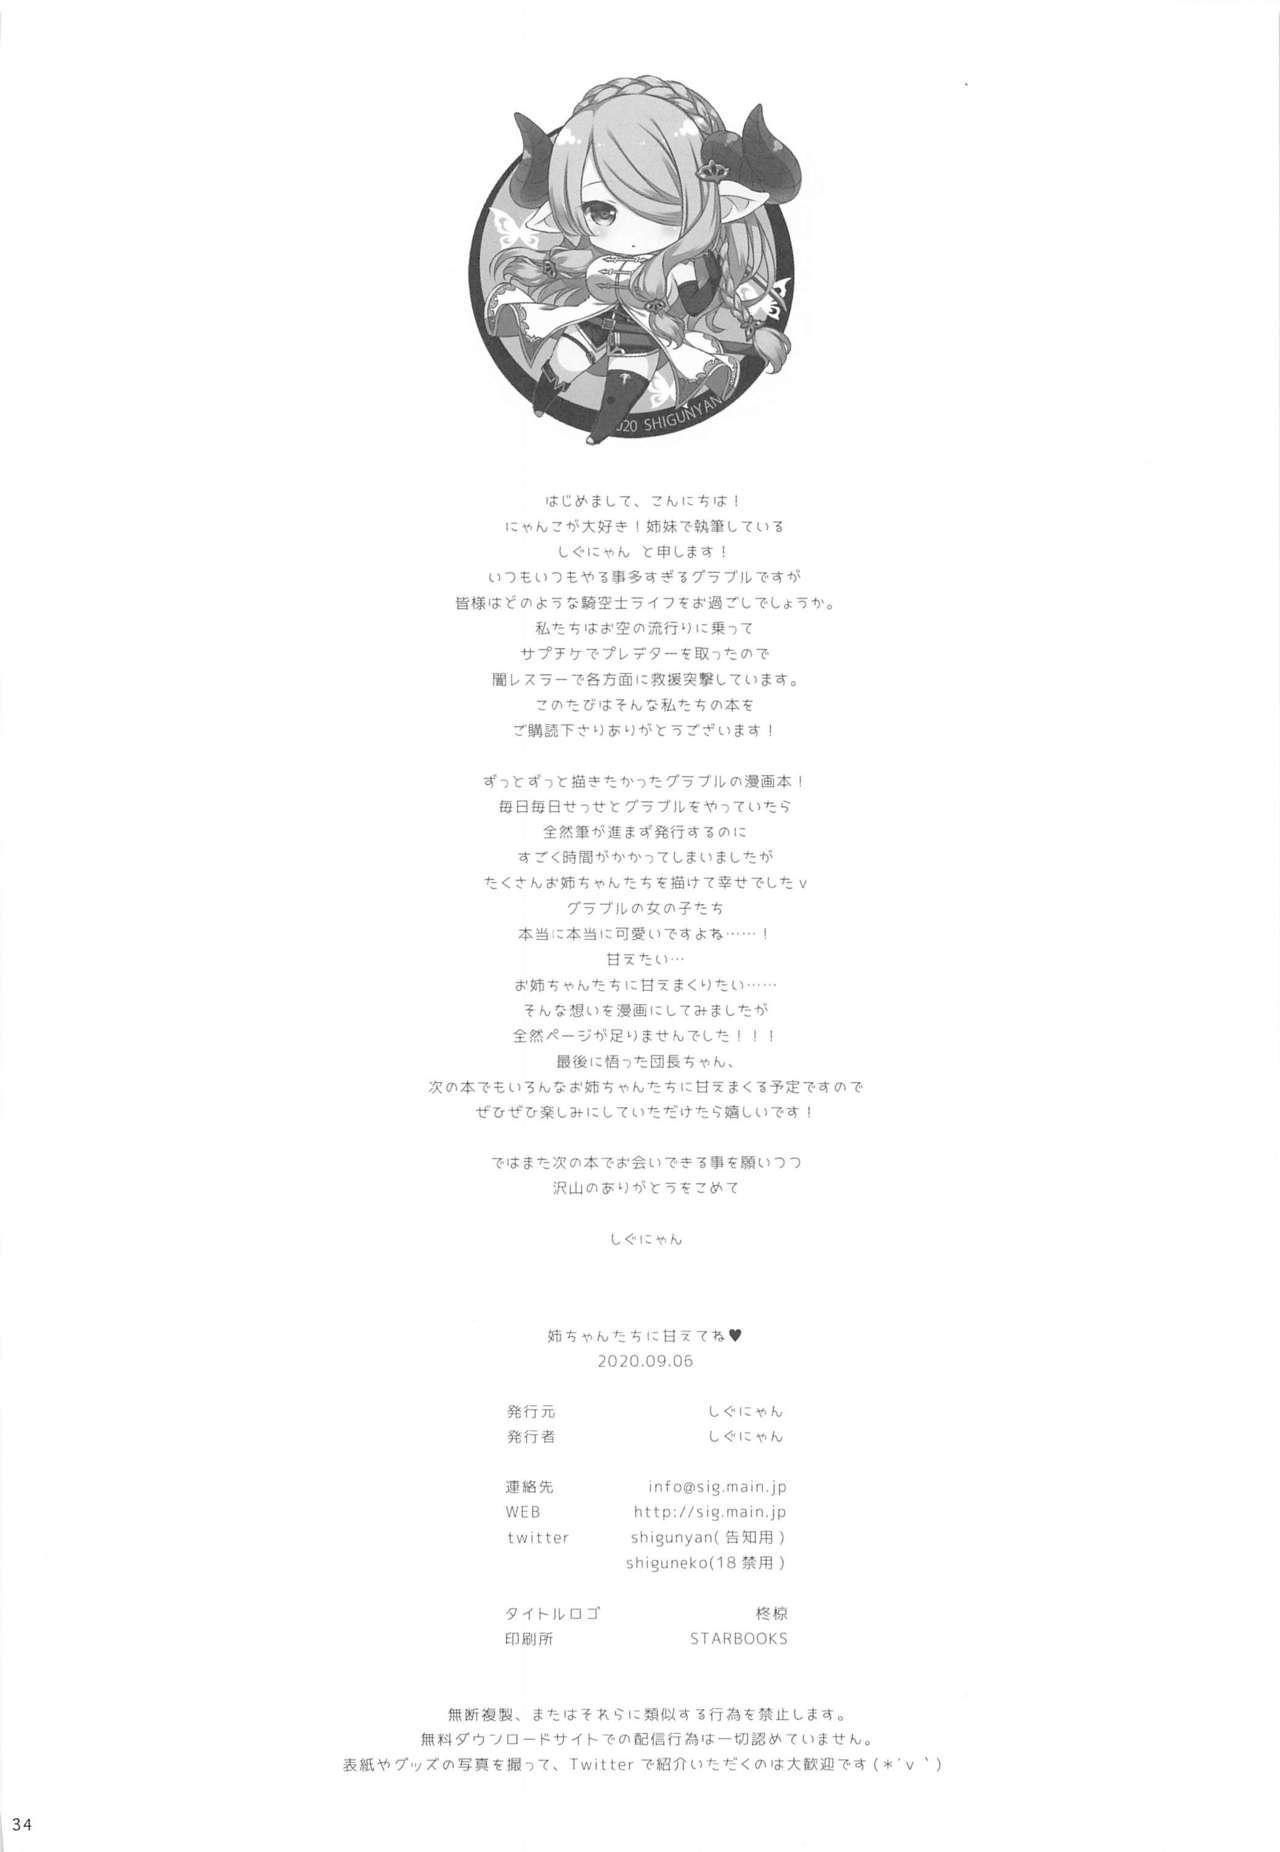 [Shigunyan (Shigunyan)] Onee-chan-tachi ni Amaete ne (Granblue Fantasy) 32